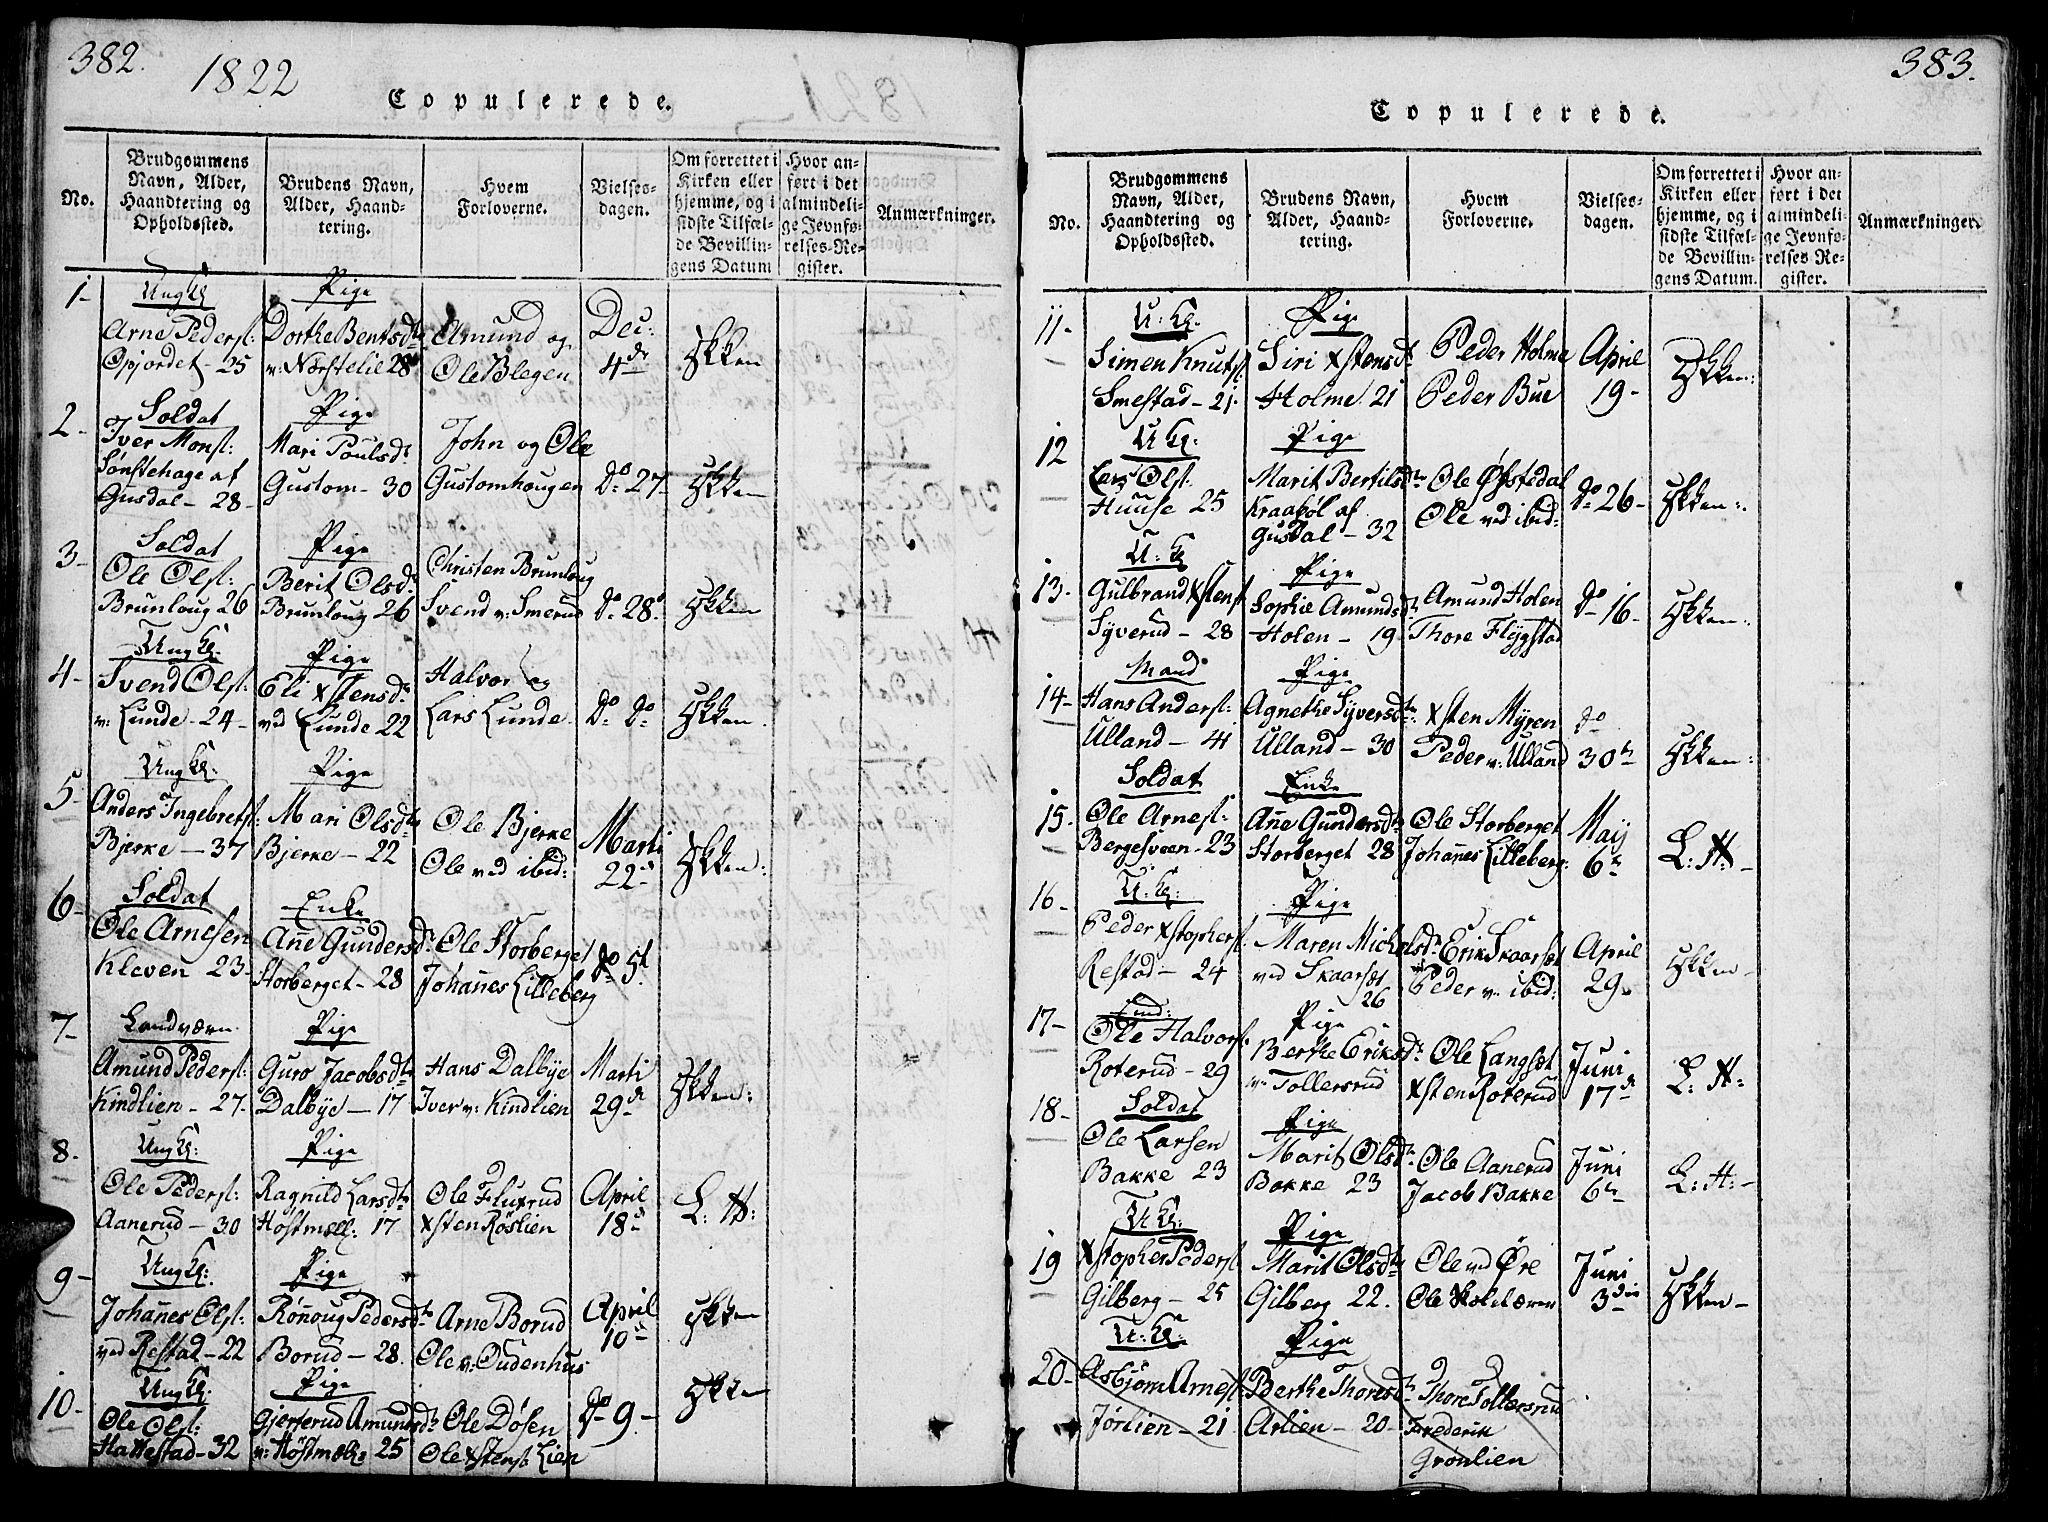 SAH, Fåberg prestekontor, Klokkerbok nr. 4, 1818-1837, s. 382-383